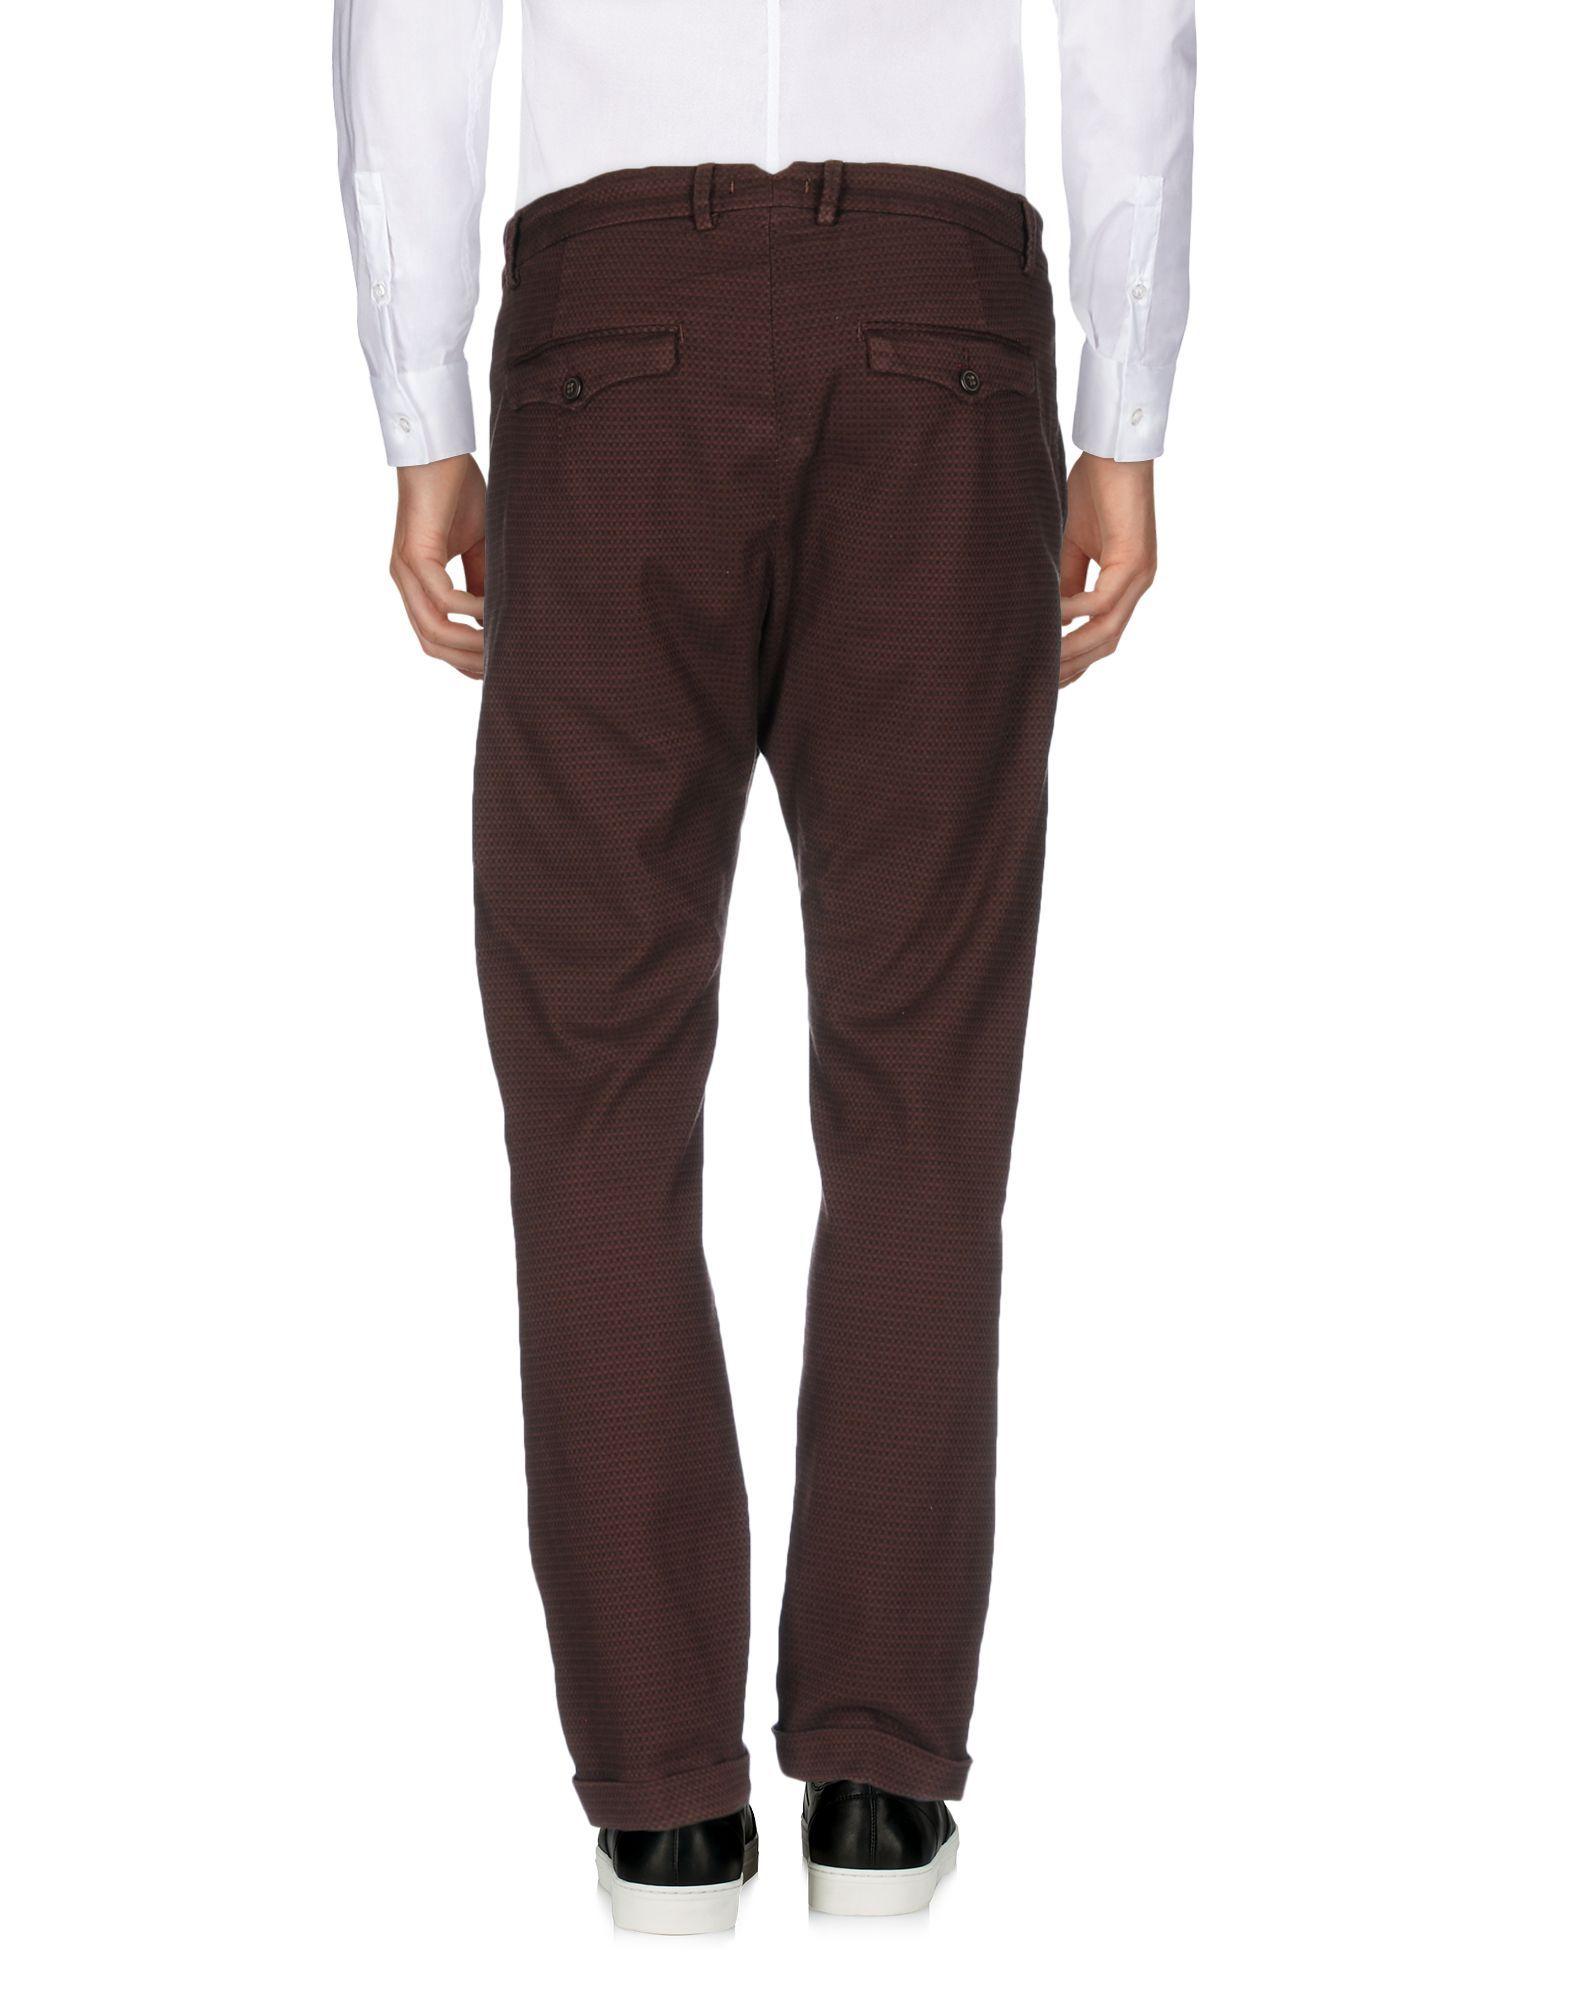 True Nyc® Maroon Cotton Pantaloni